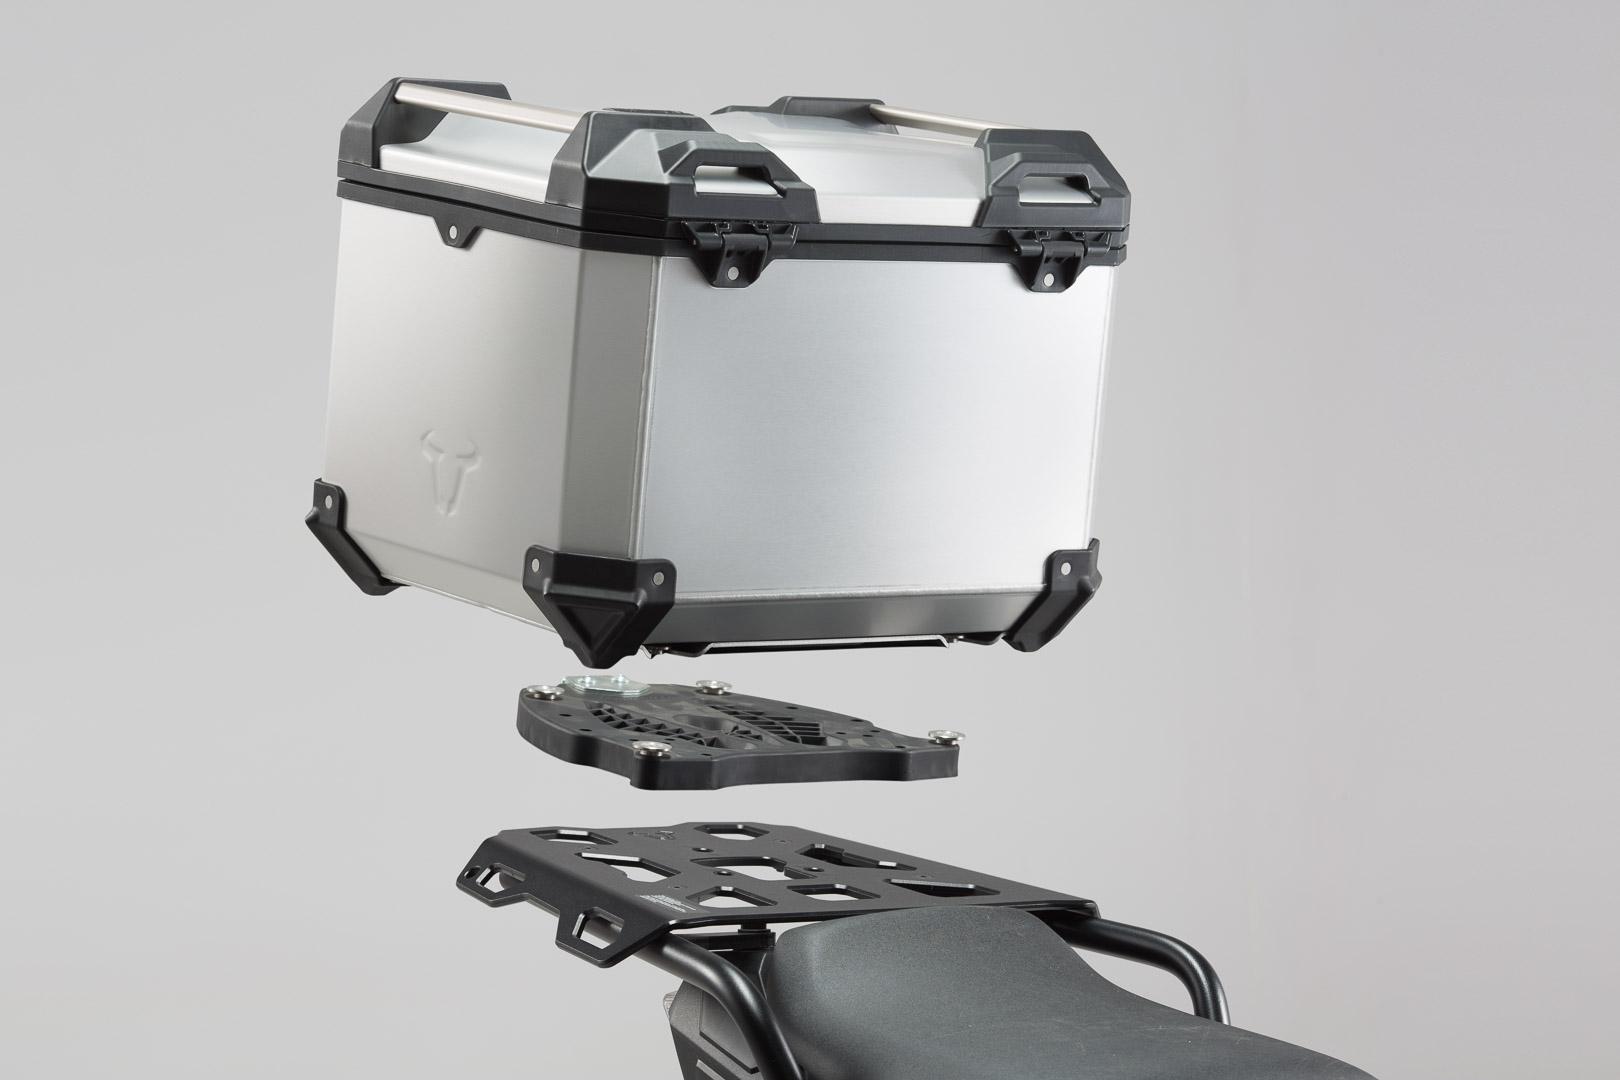 top case pour moto bmw r1200gs lc trax adv alu. Black Bedroom Furniture Sets. Home Design Ideas